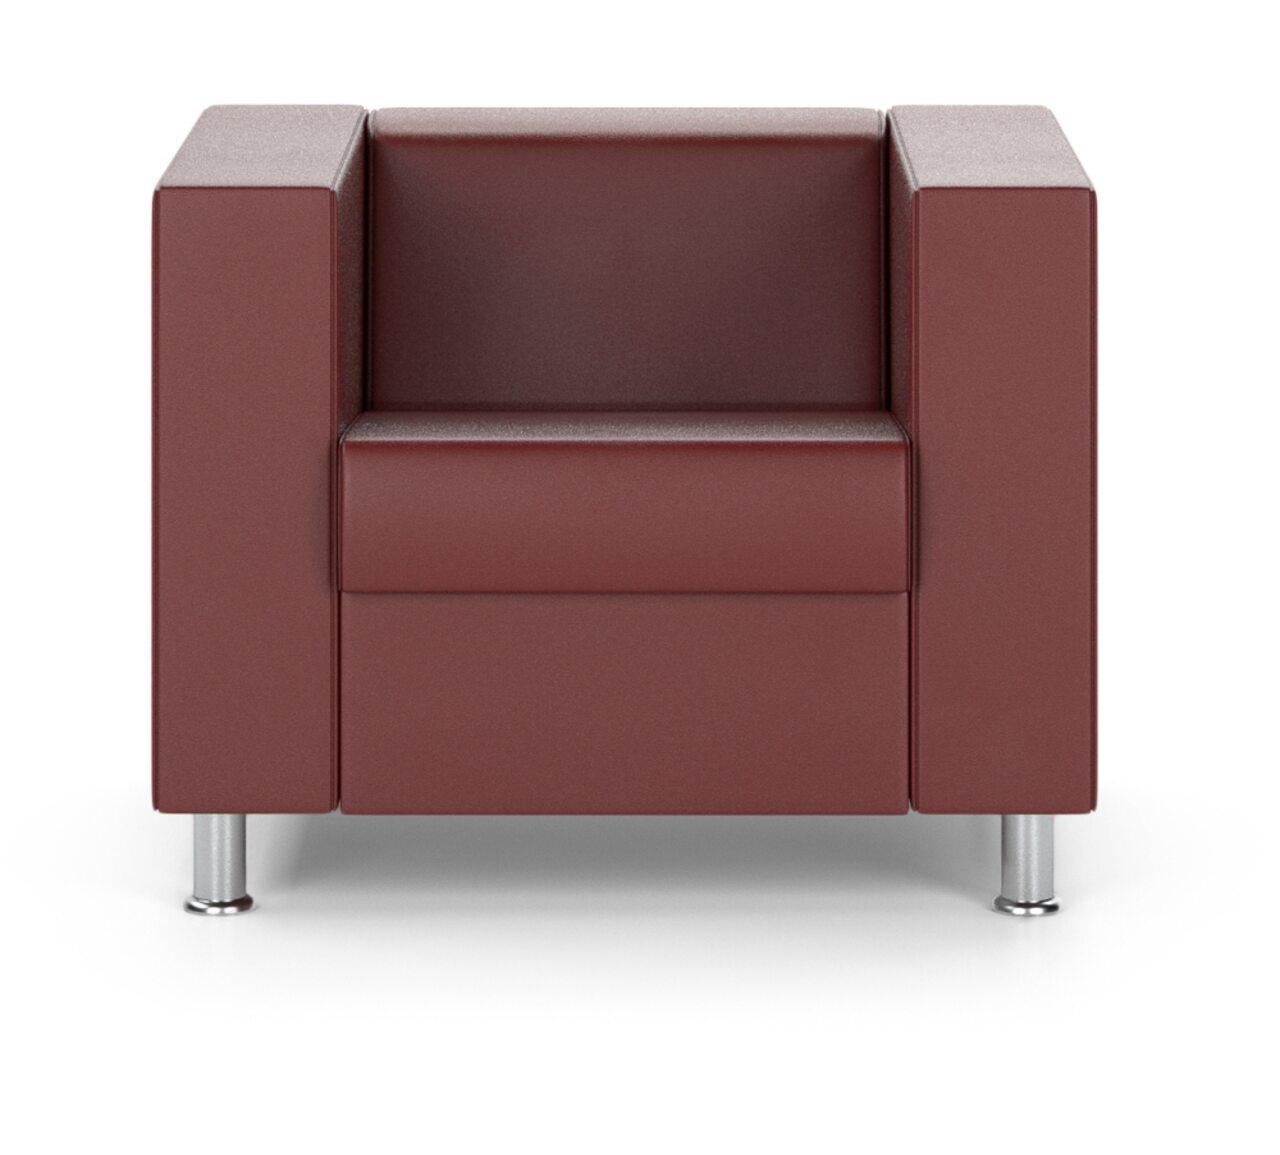 Кресло Аполло - фото 2